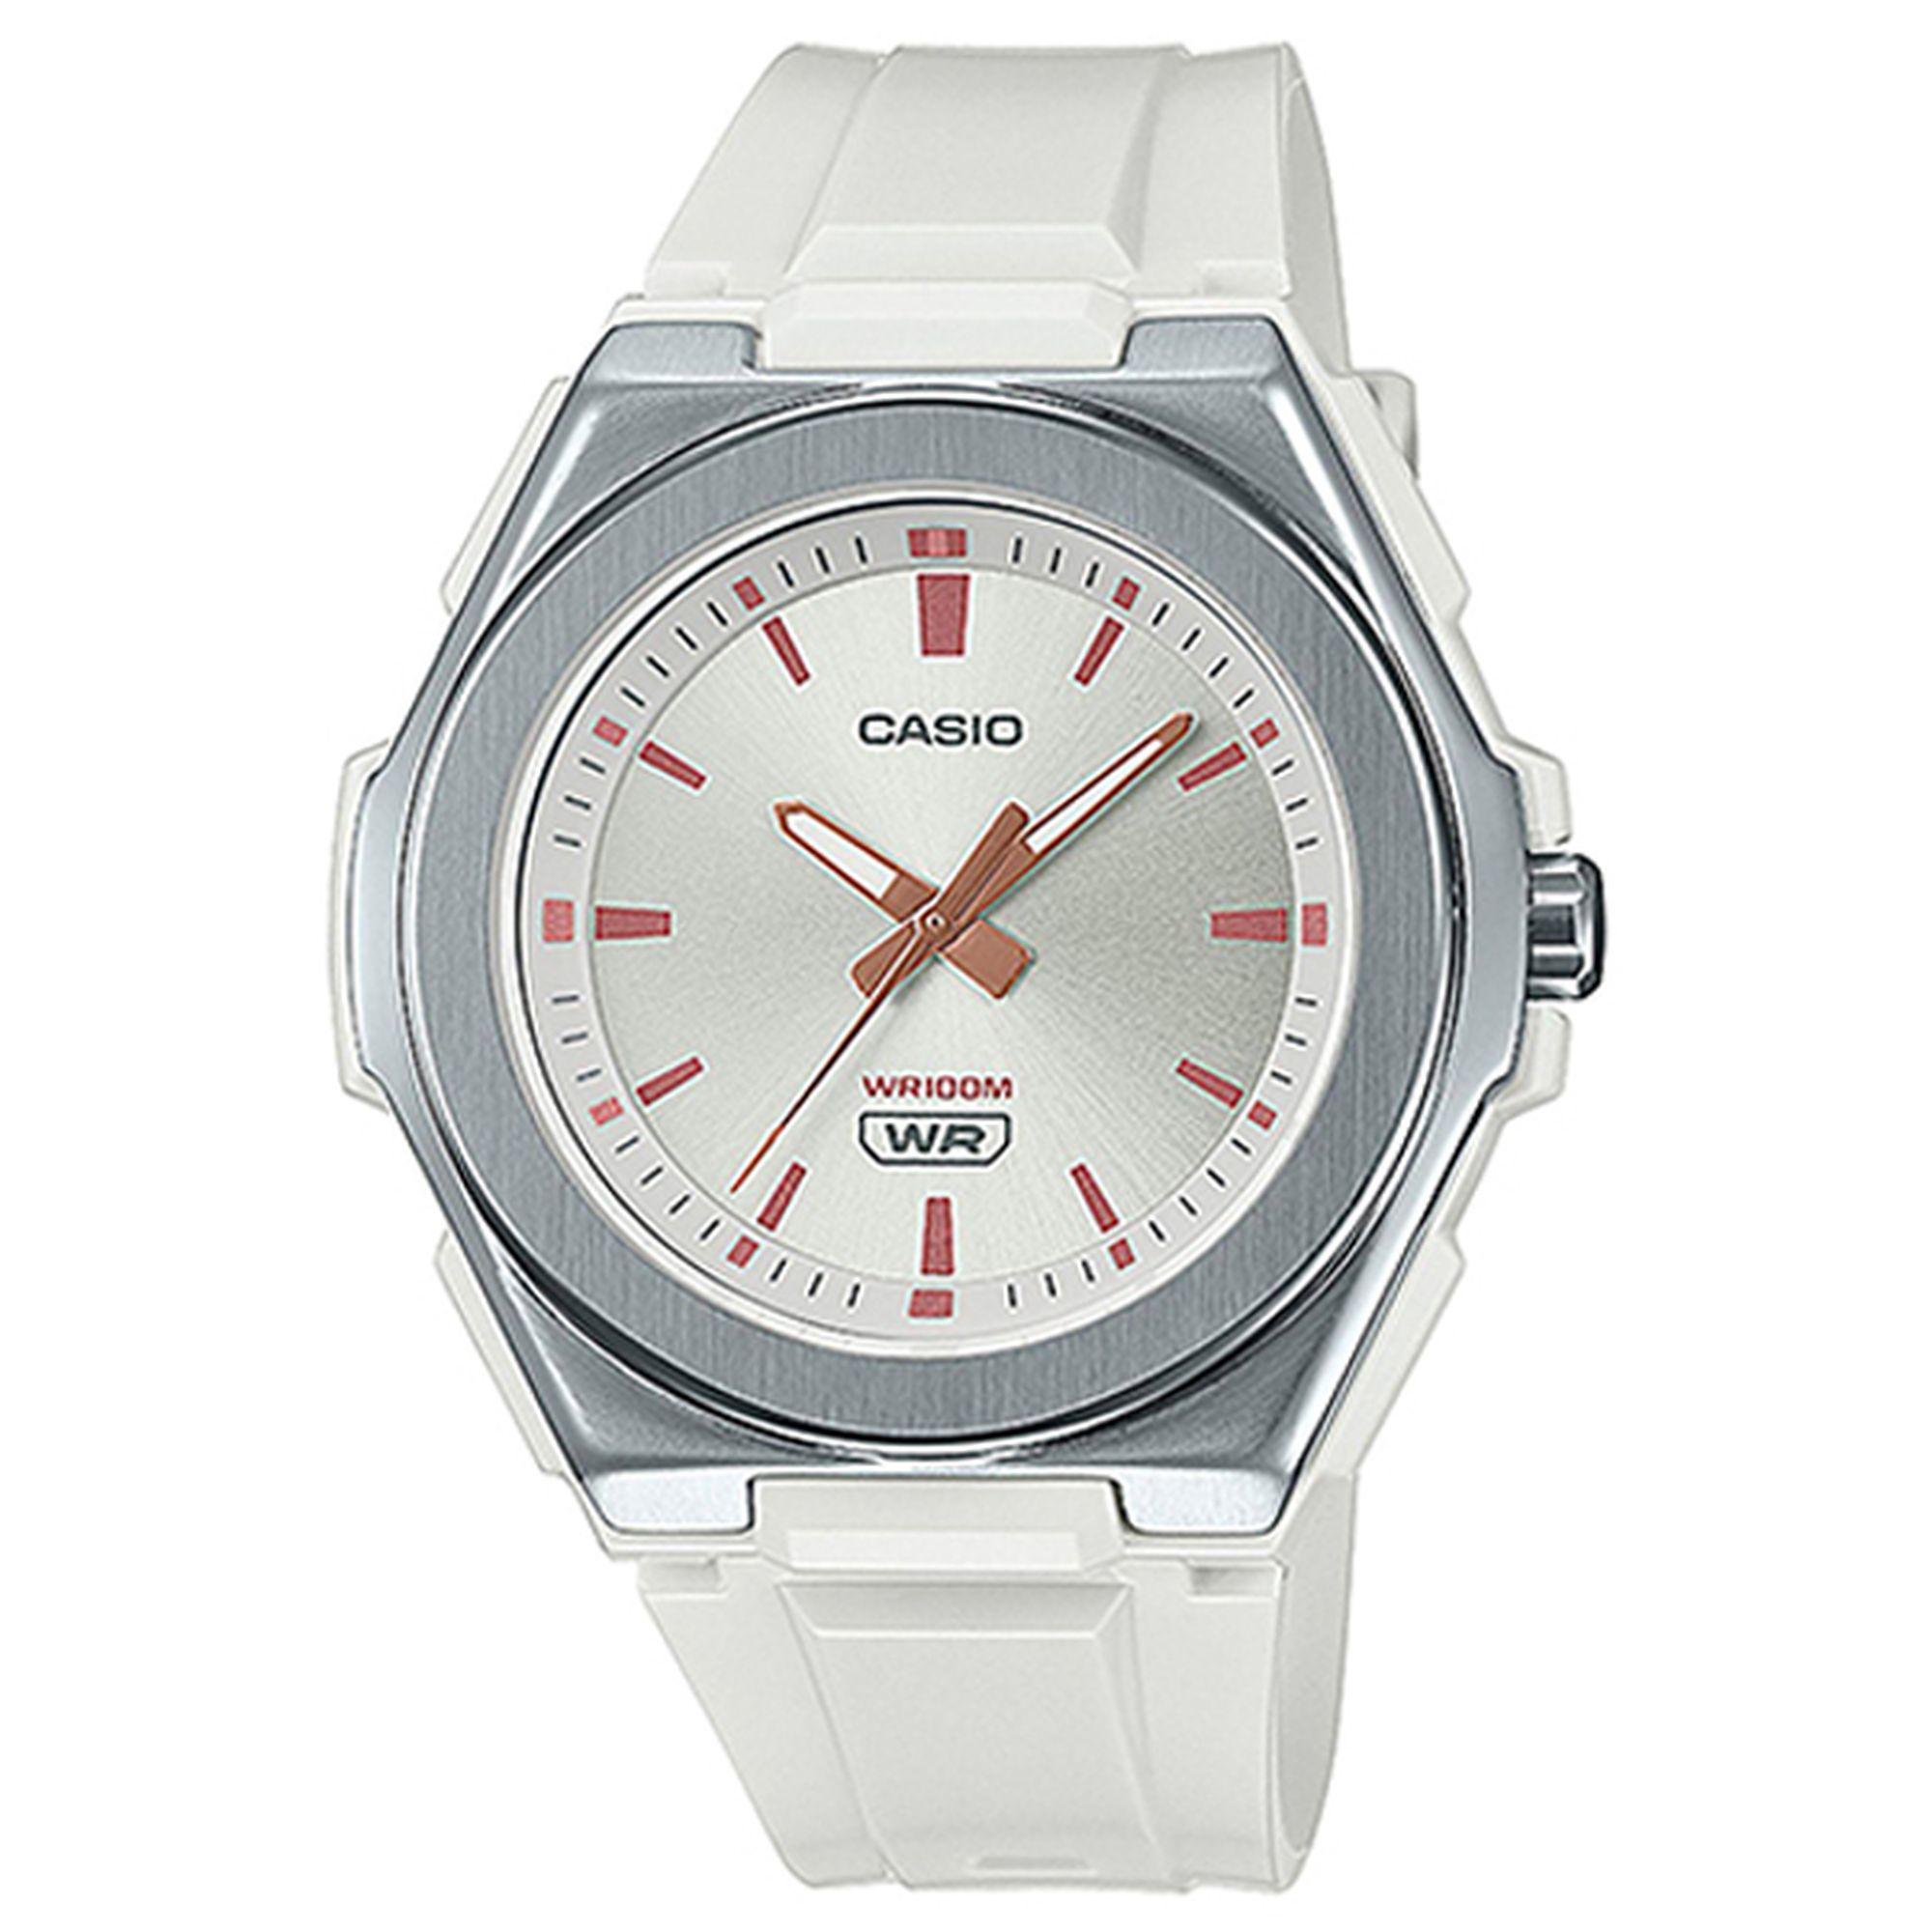 Casio Ρολόι με Λουράκι σε Λευκό χρώμα LWA-300H-7EVEF